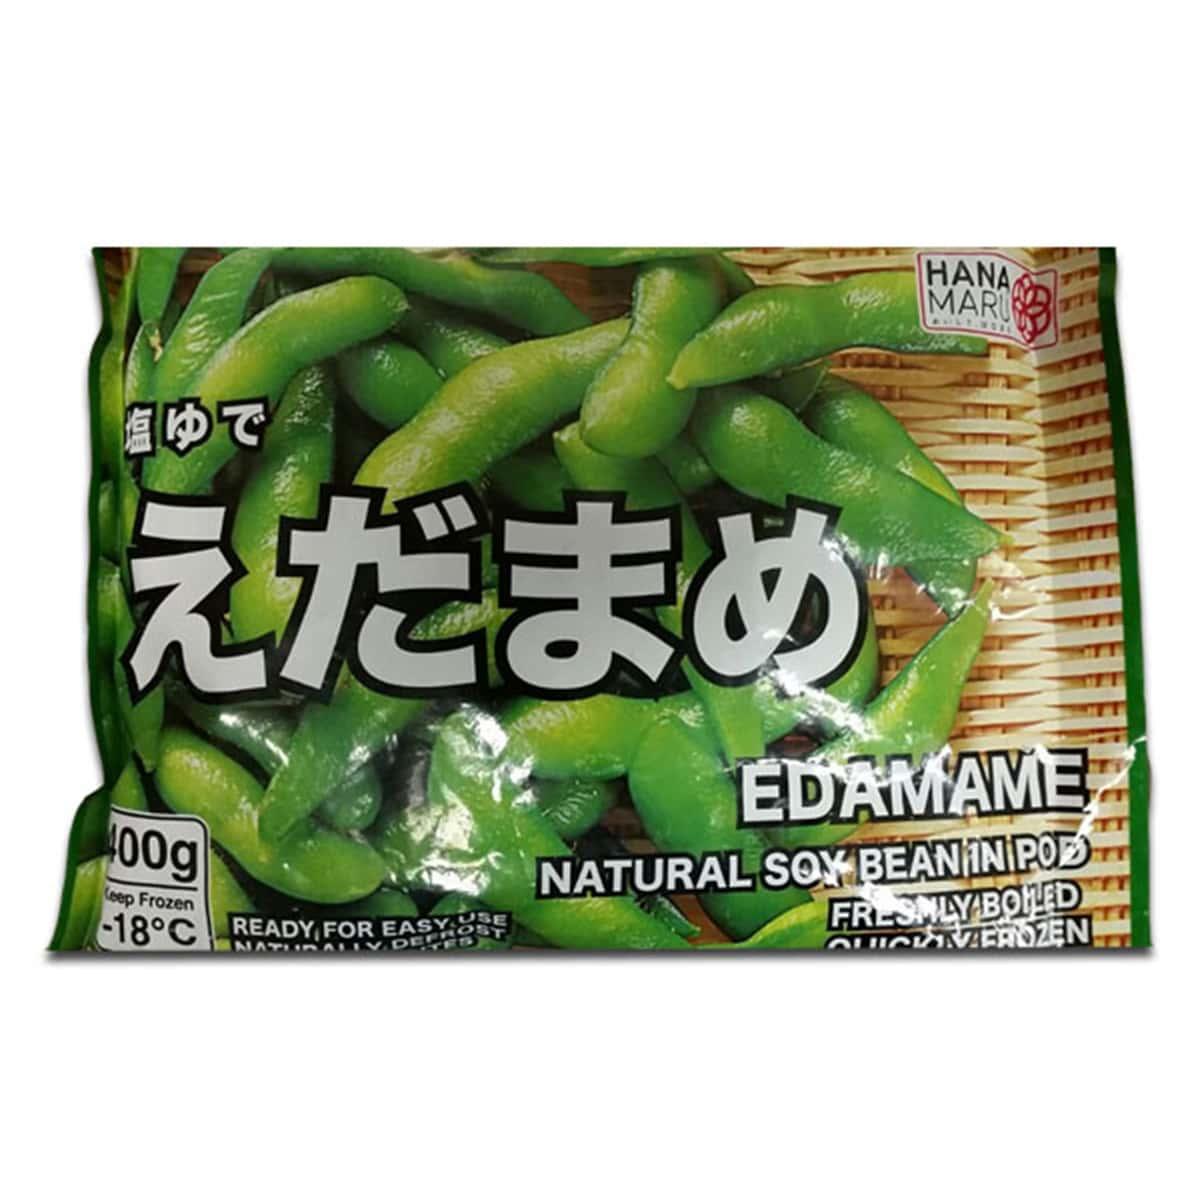 Buy Hana Maru Frozen Edamame Natural Soybean in Pod - 400 gm